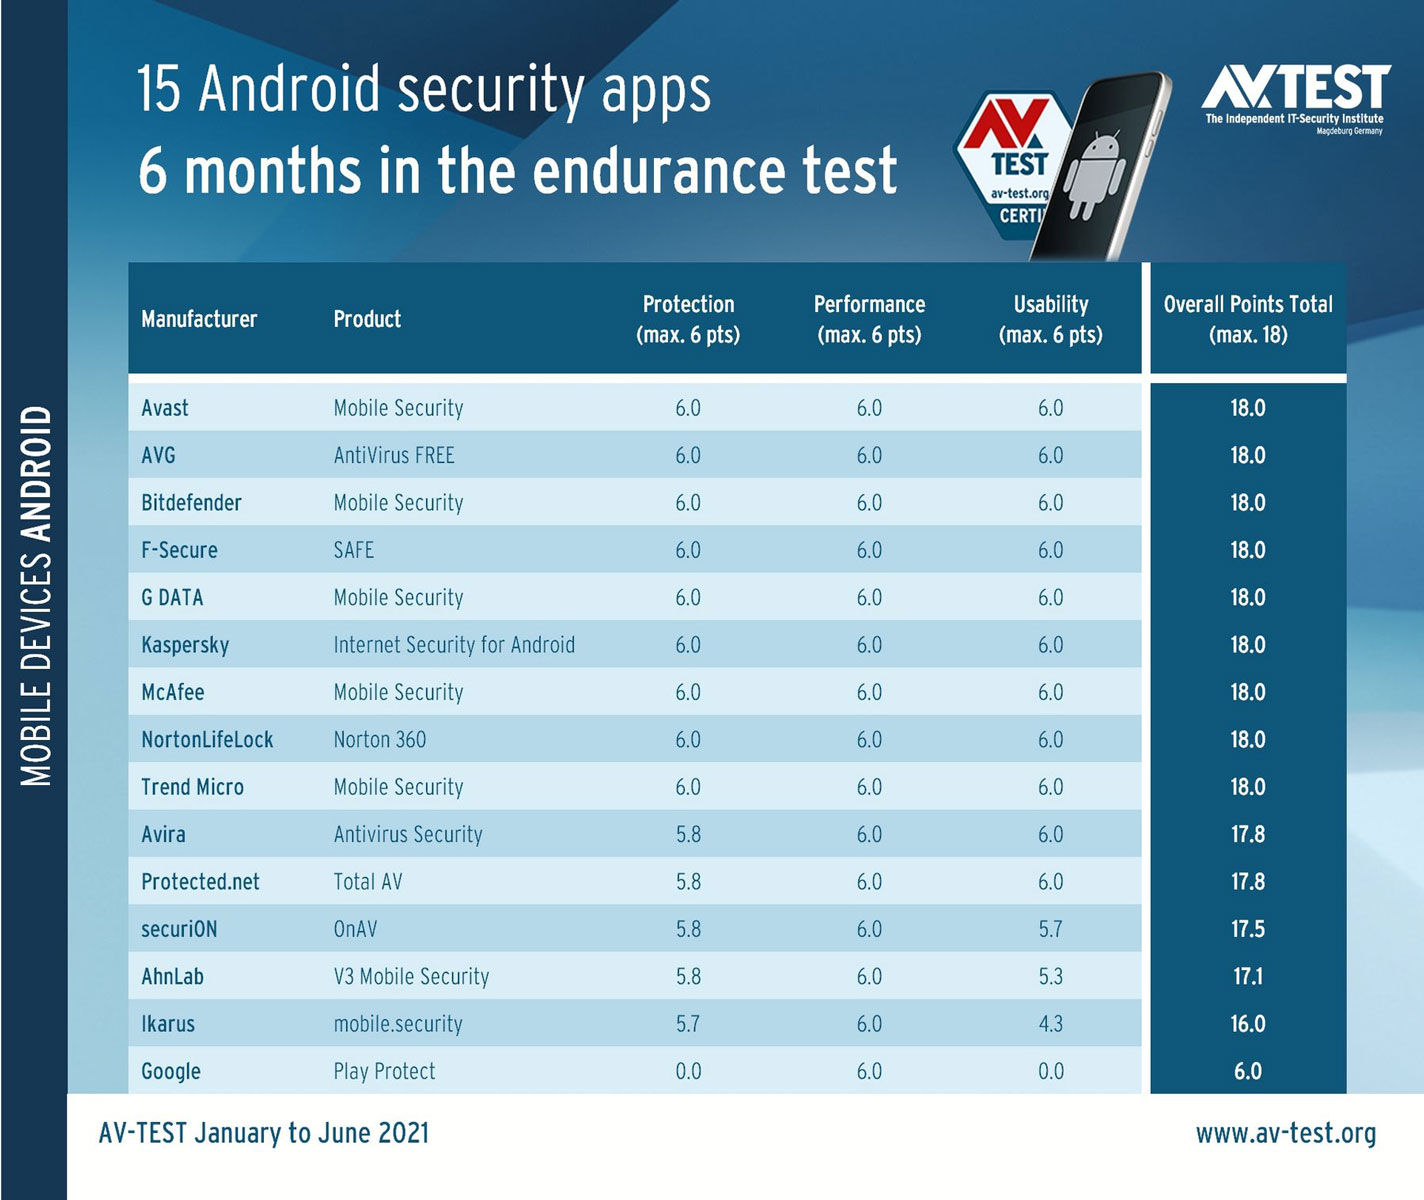 Google Play Protect test antivirus